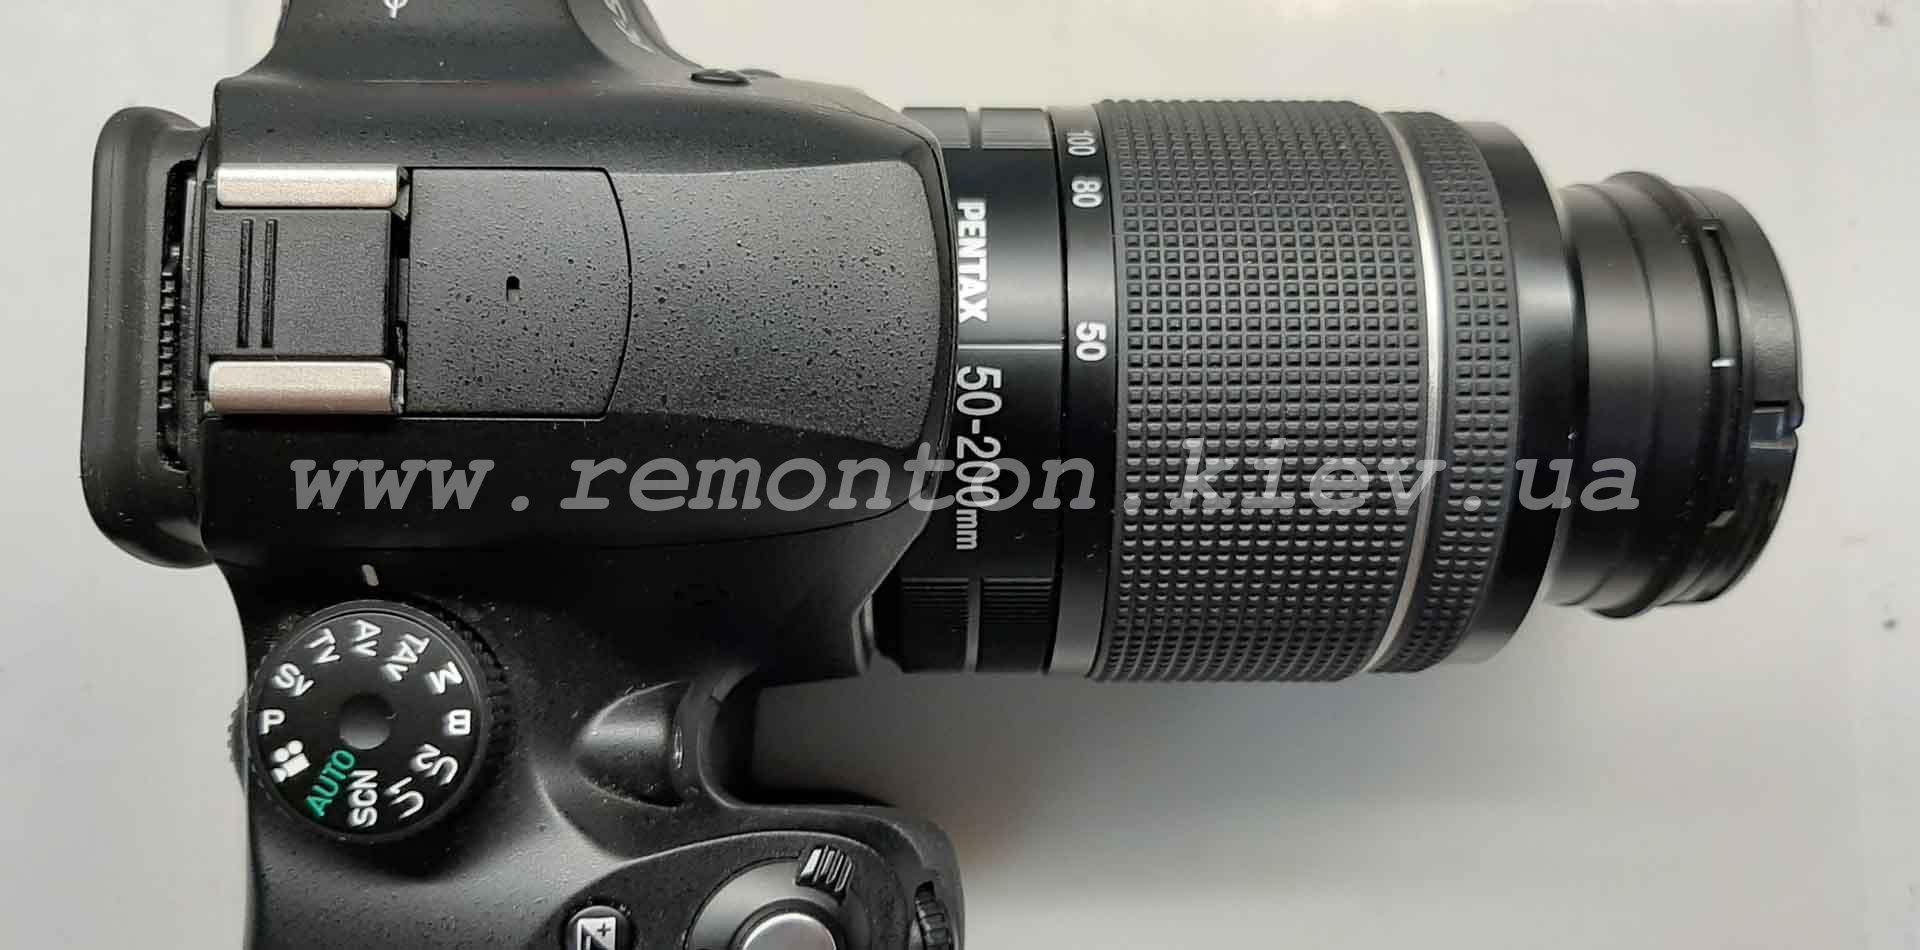 Ремонт Pentax K50 - хлопает зеркало